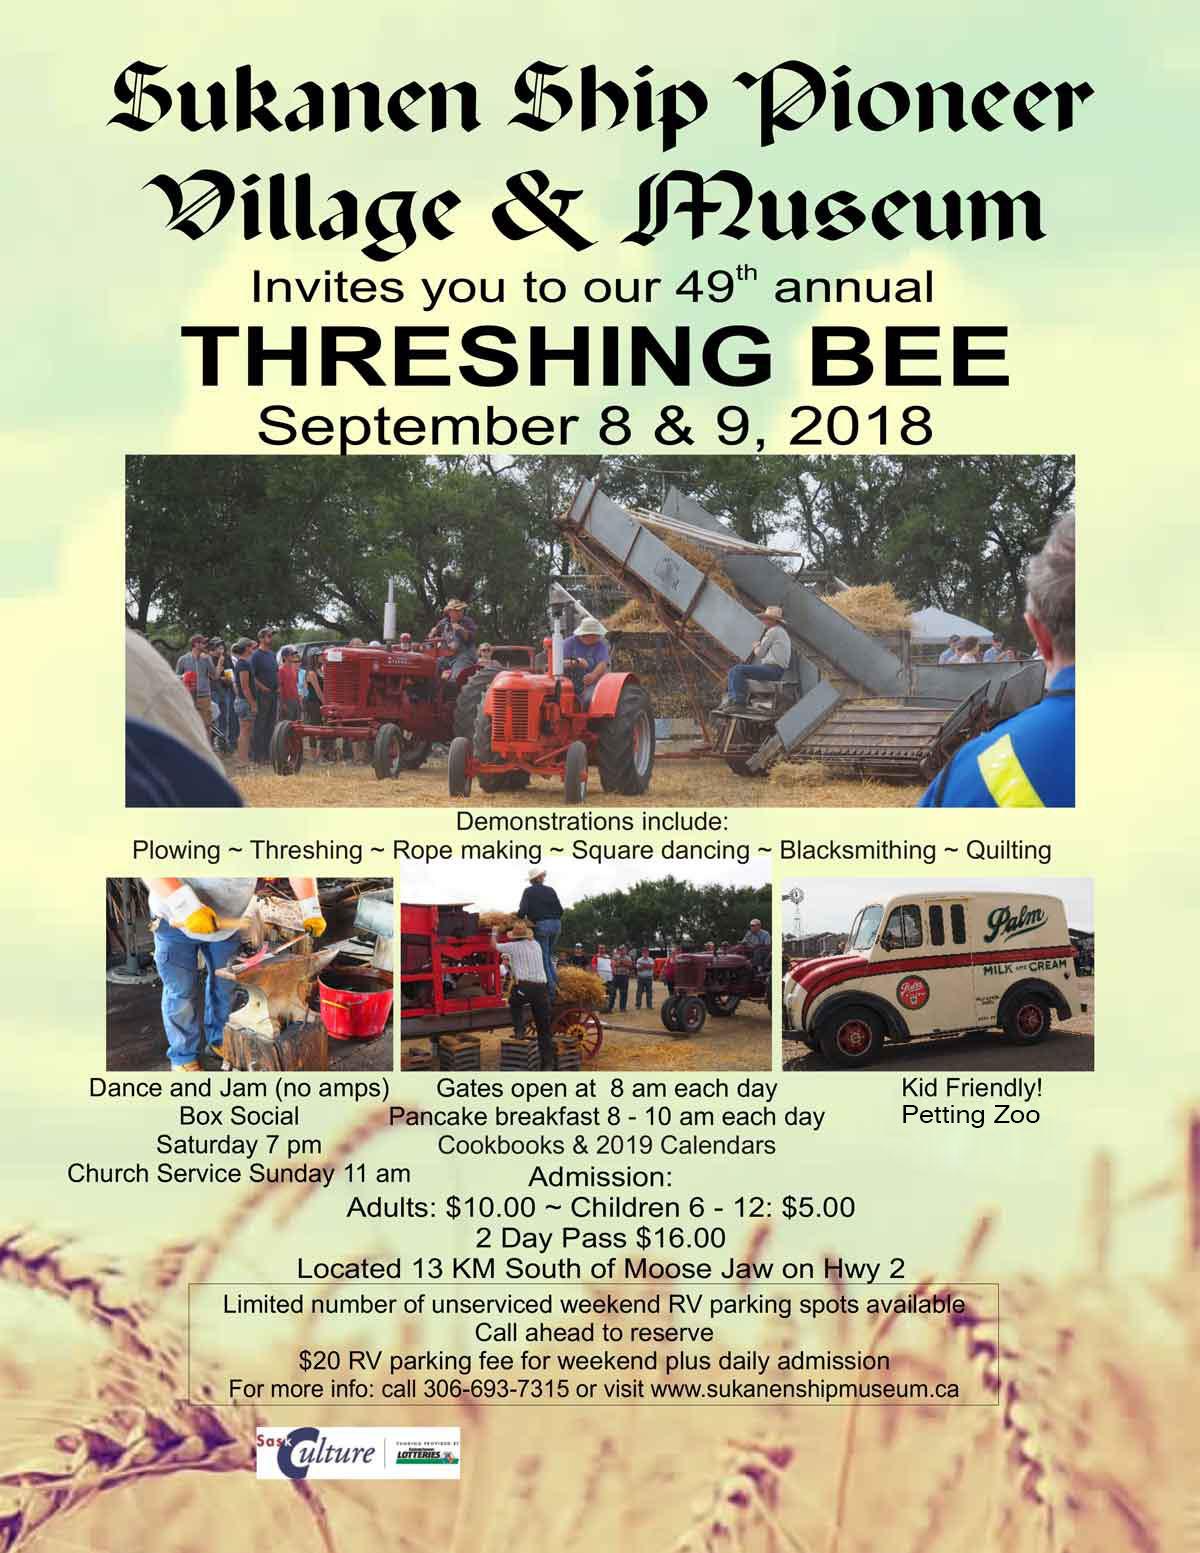 Sukanen Ship Pioneer Village & Museum Threshing Bee